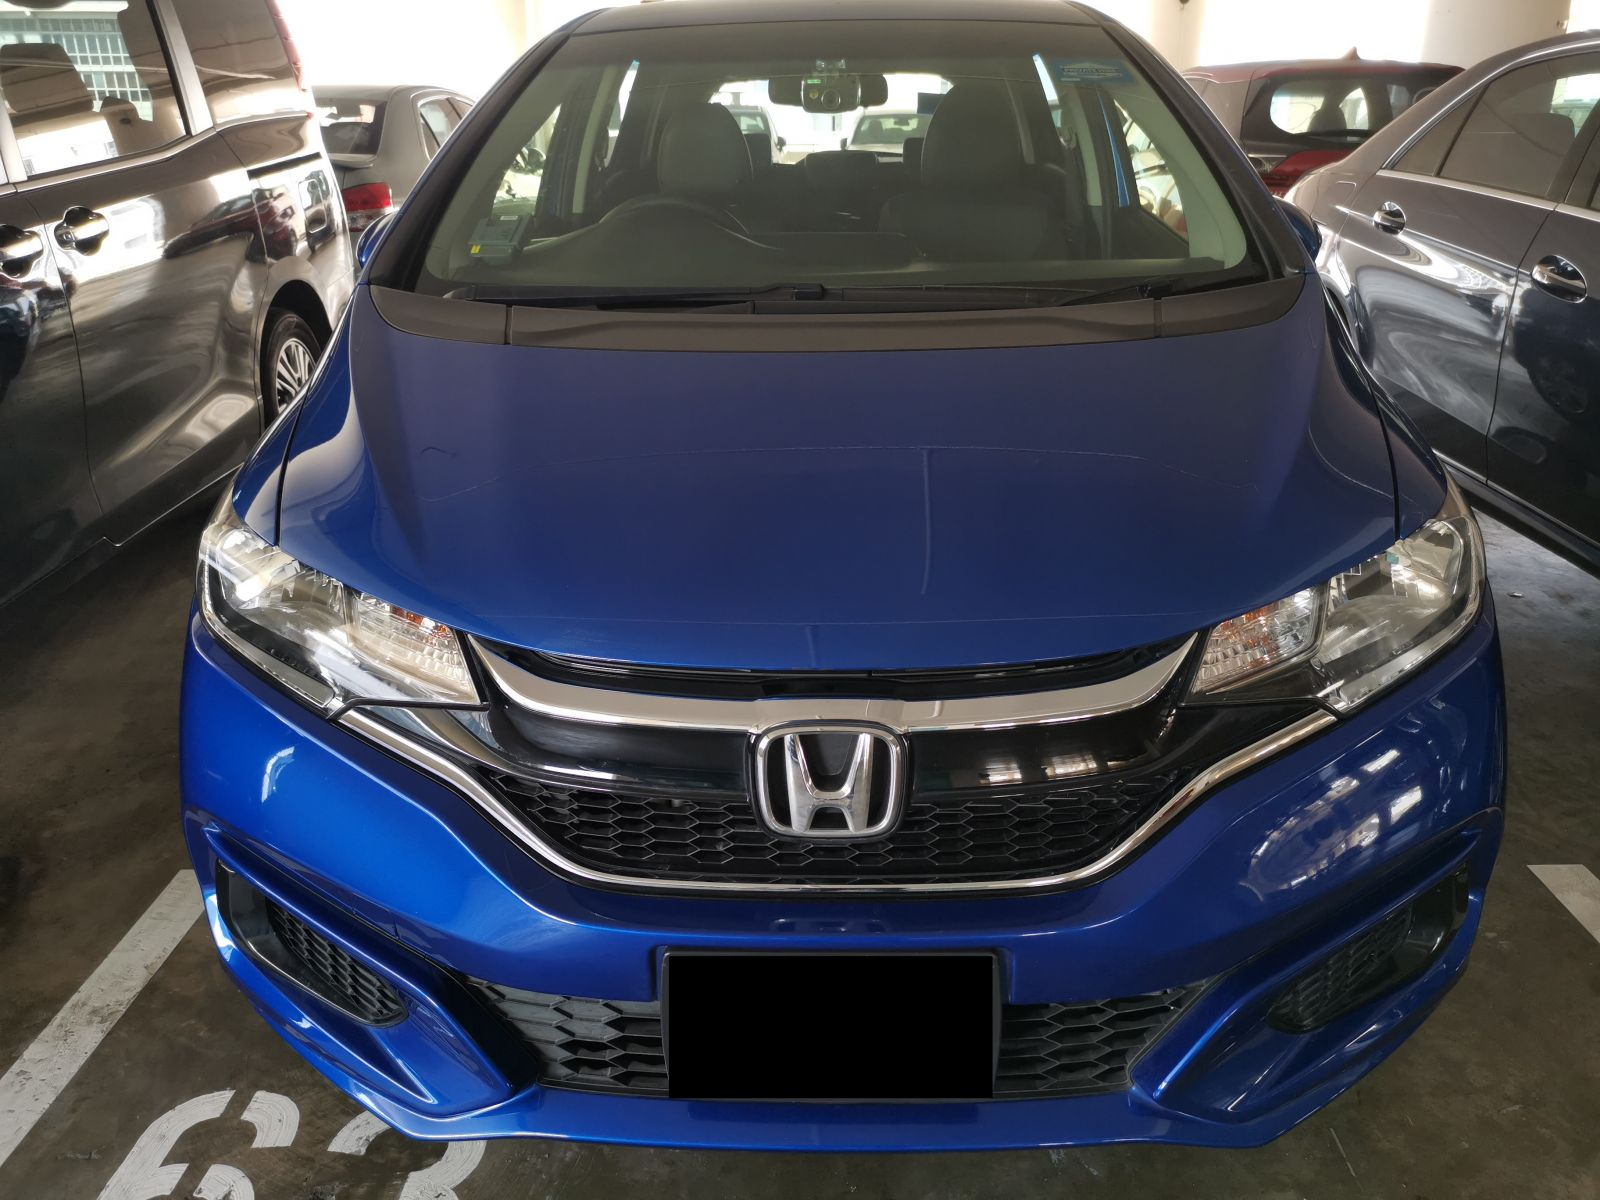 Honda Fit (Private Hire)